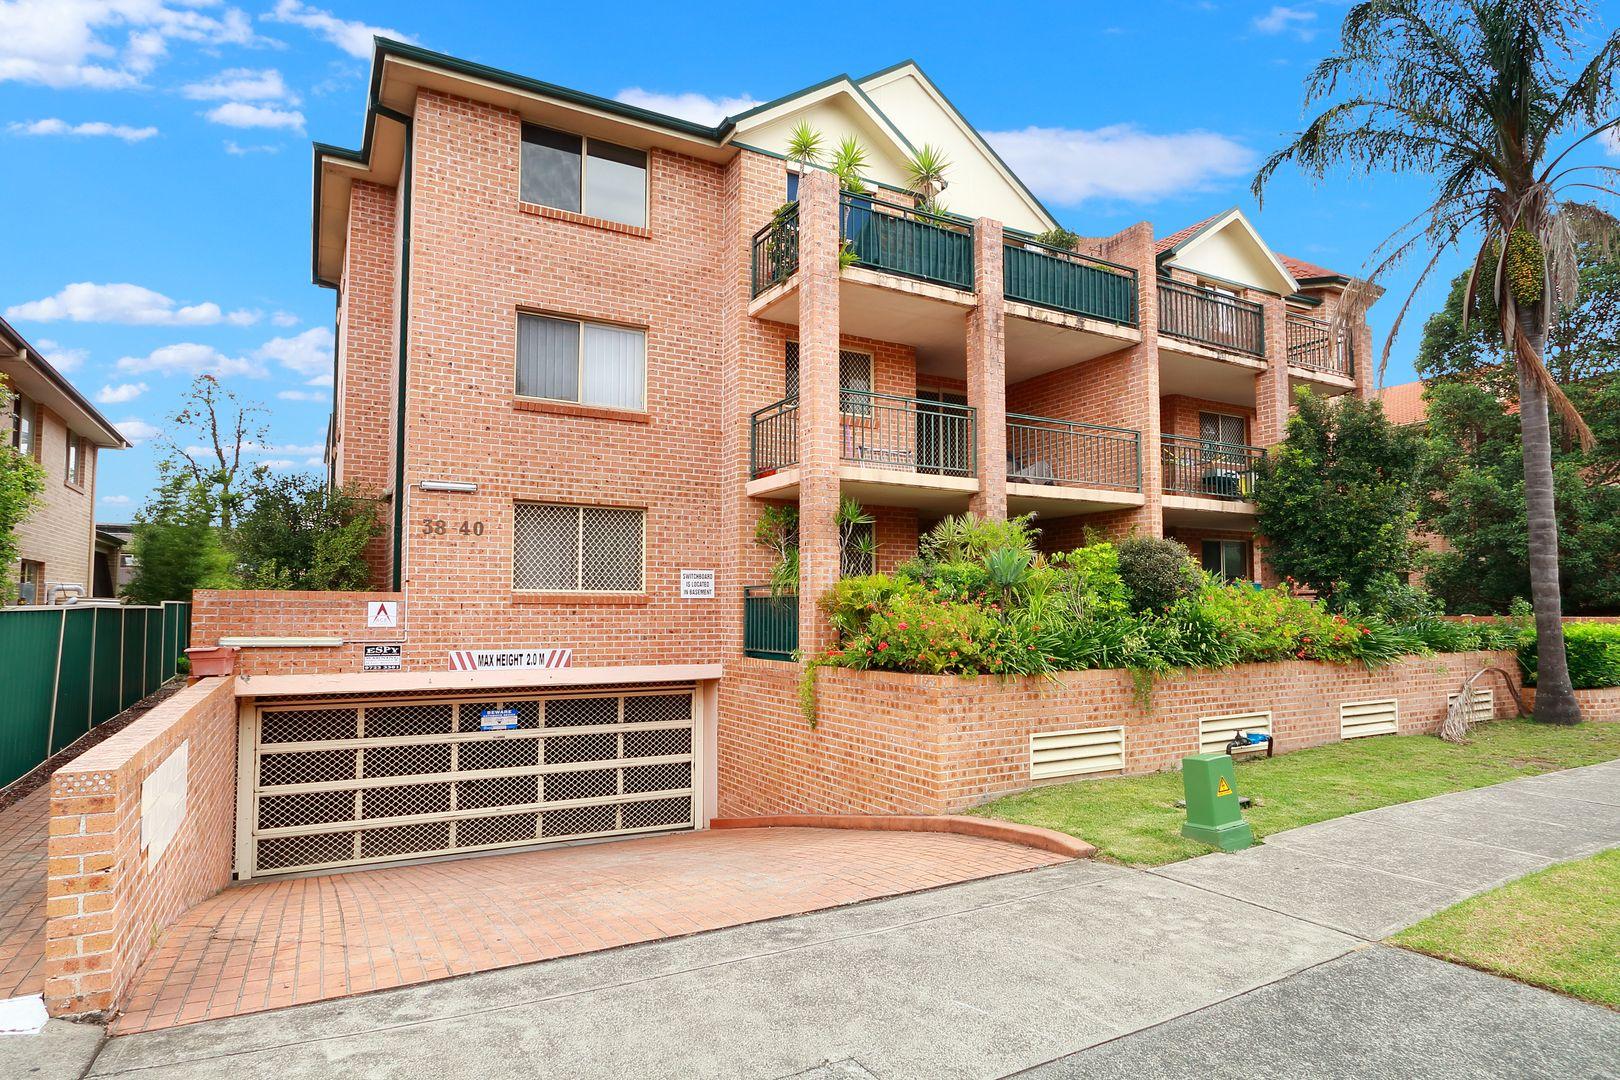 13/38-40 Hampden street, Beverly Hills NSW 2209, Image 0